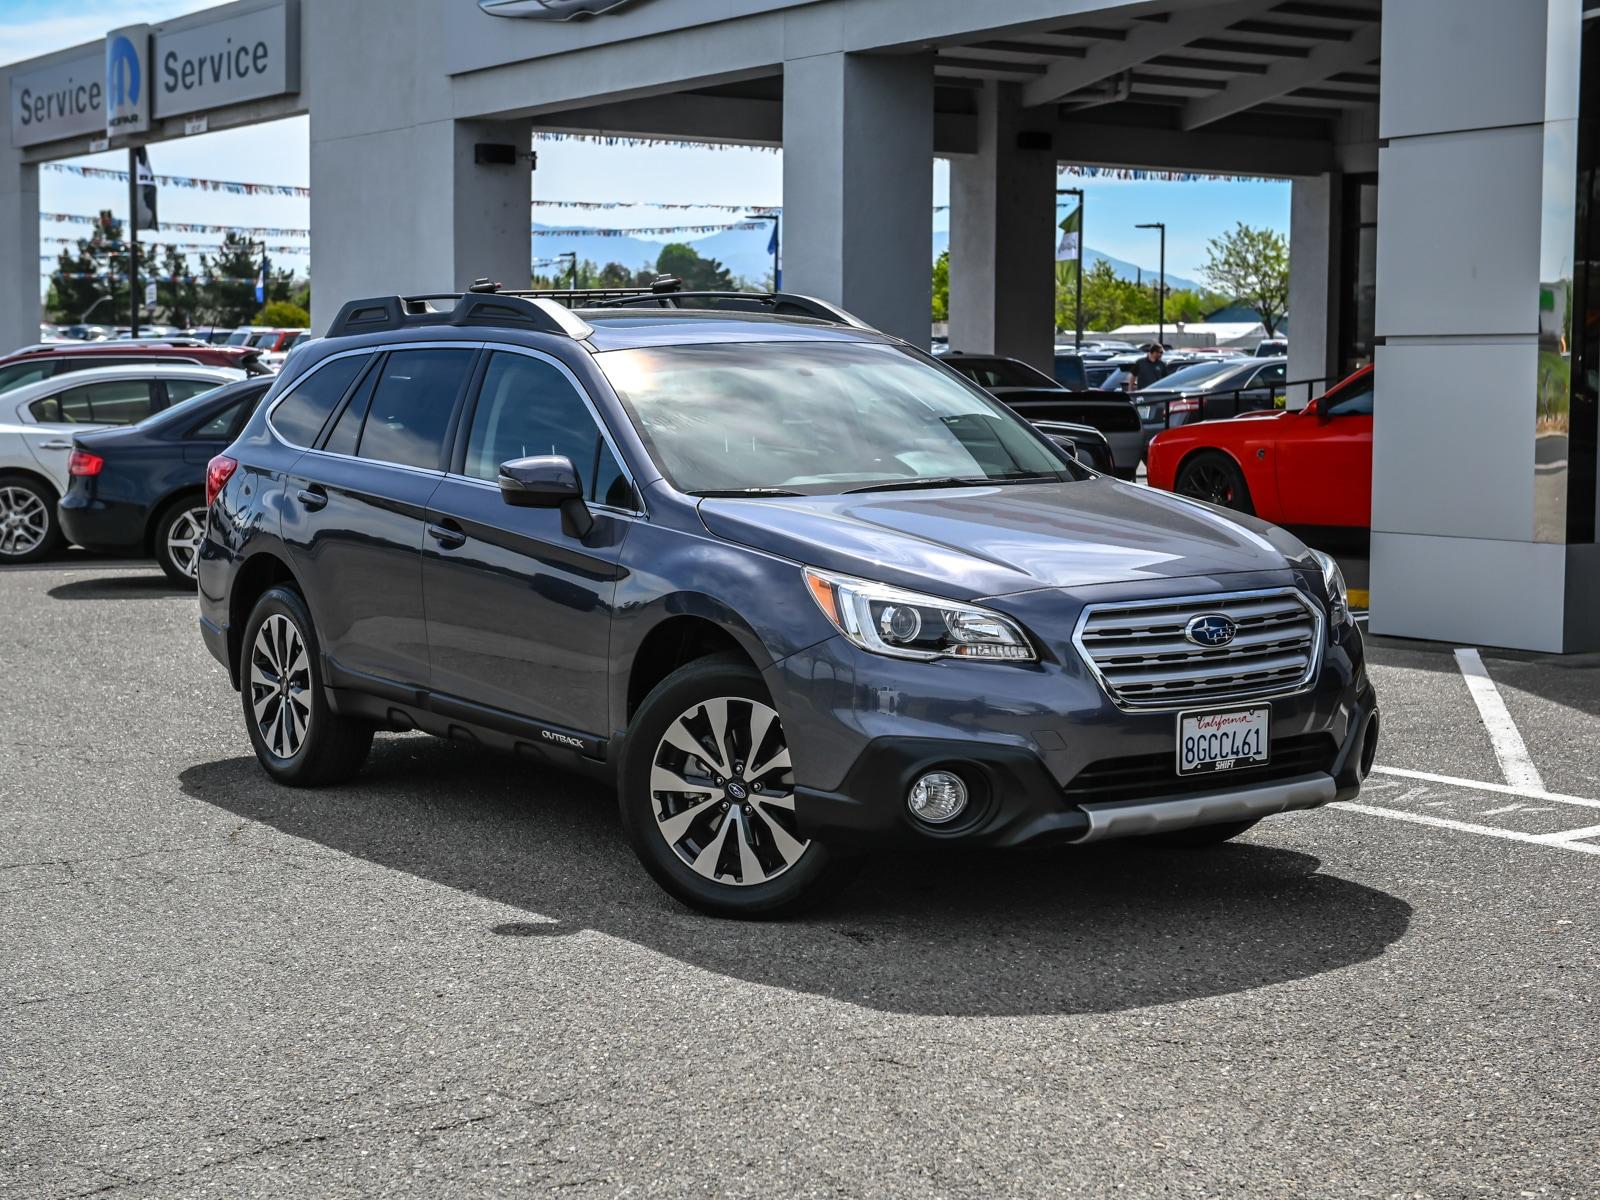 Used 2017 Subaru Outback 2.5i Limited Sport Utility Concord, CA